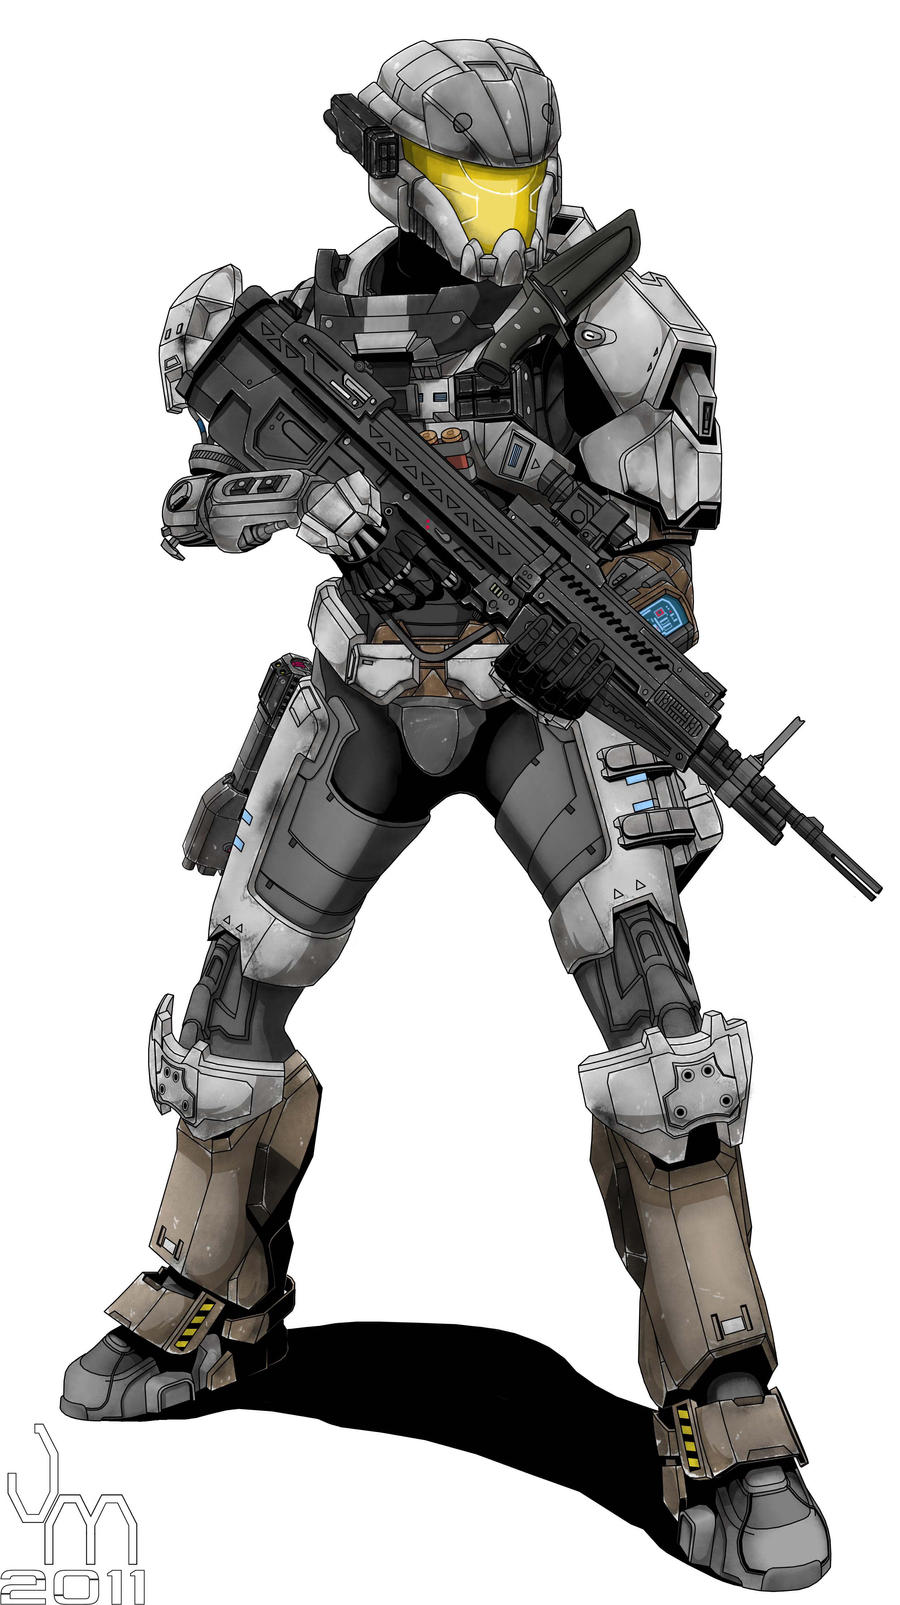 Spartan concept 2 by philorion7